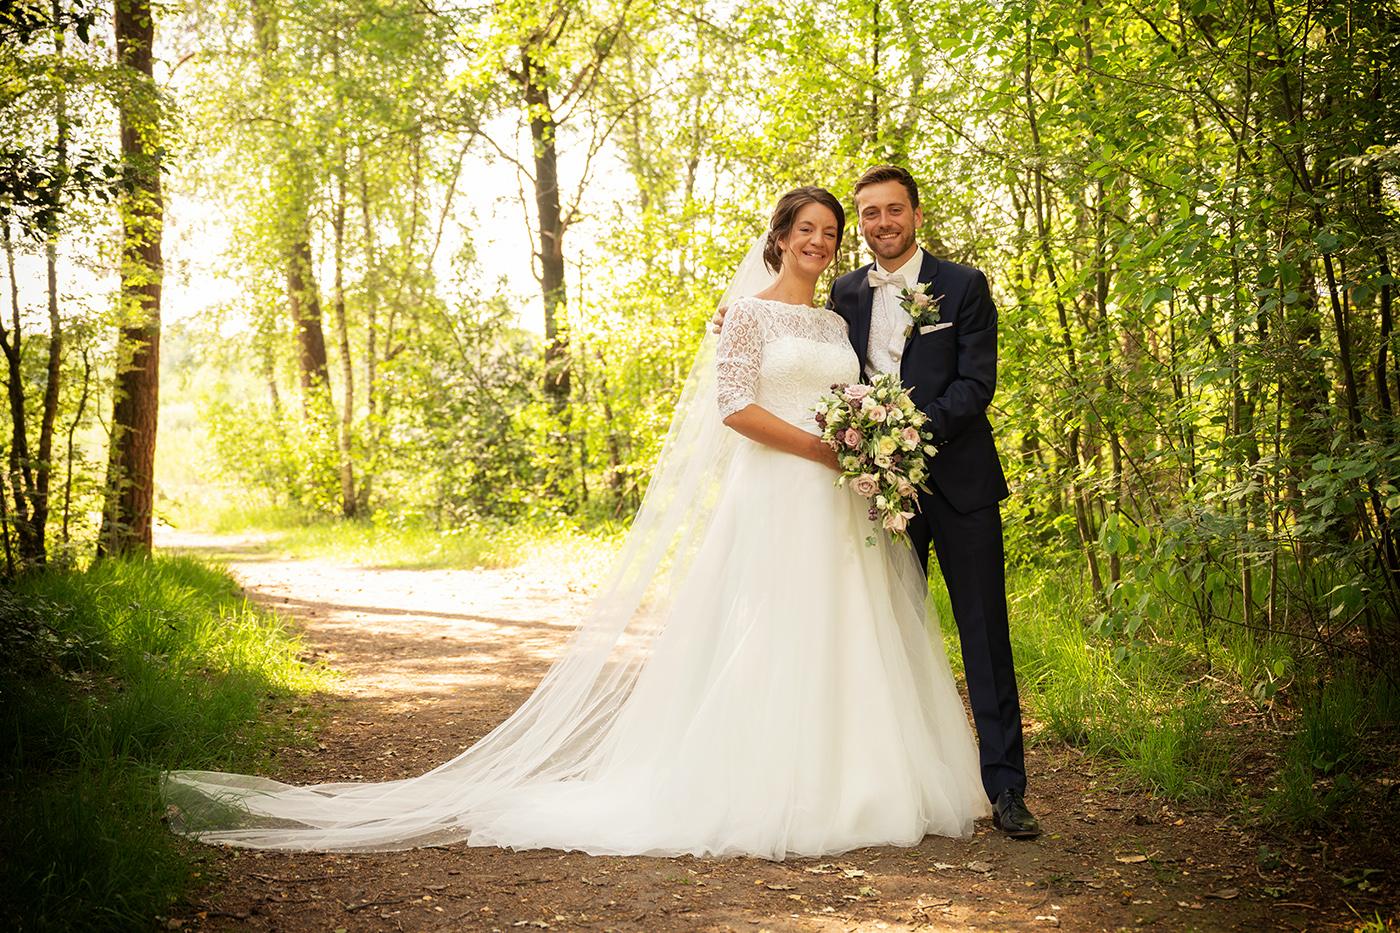 bruidsfotografie fotograaf Wouter van Middendorp Uddel Barneveld website